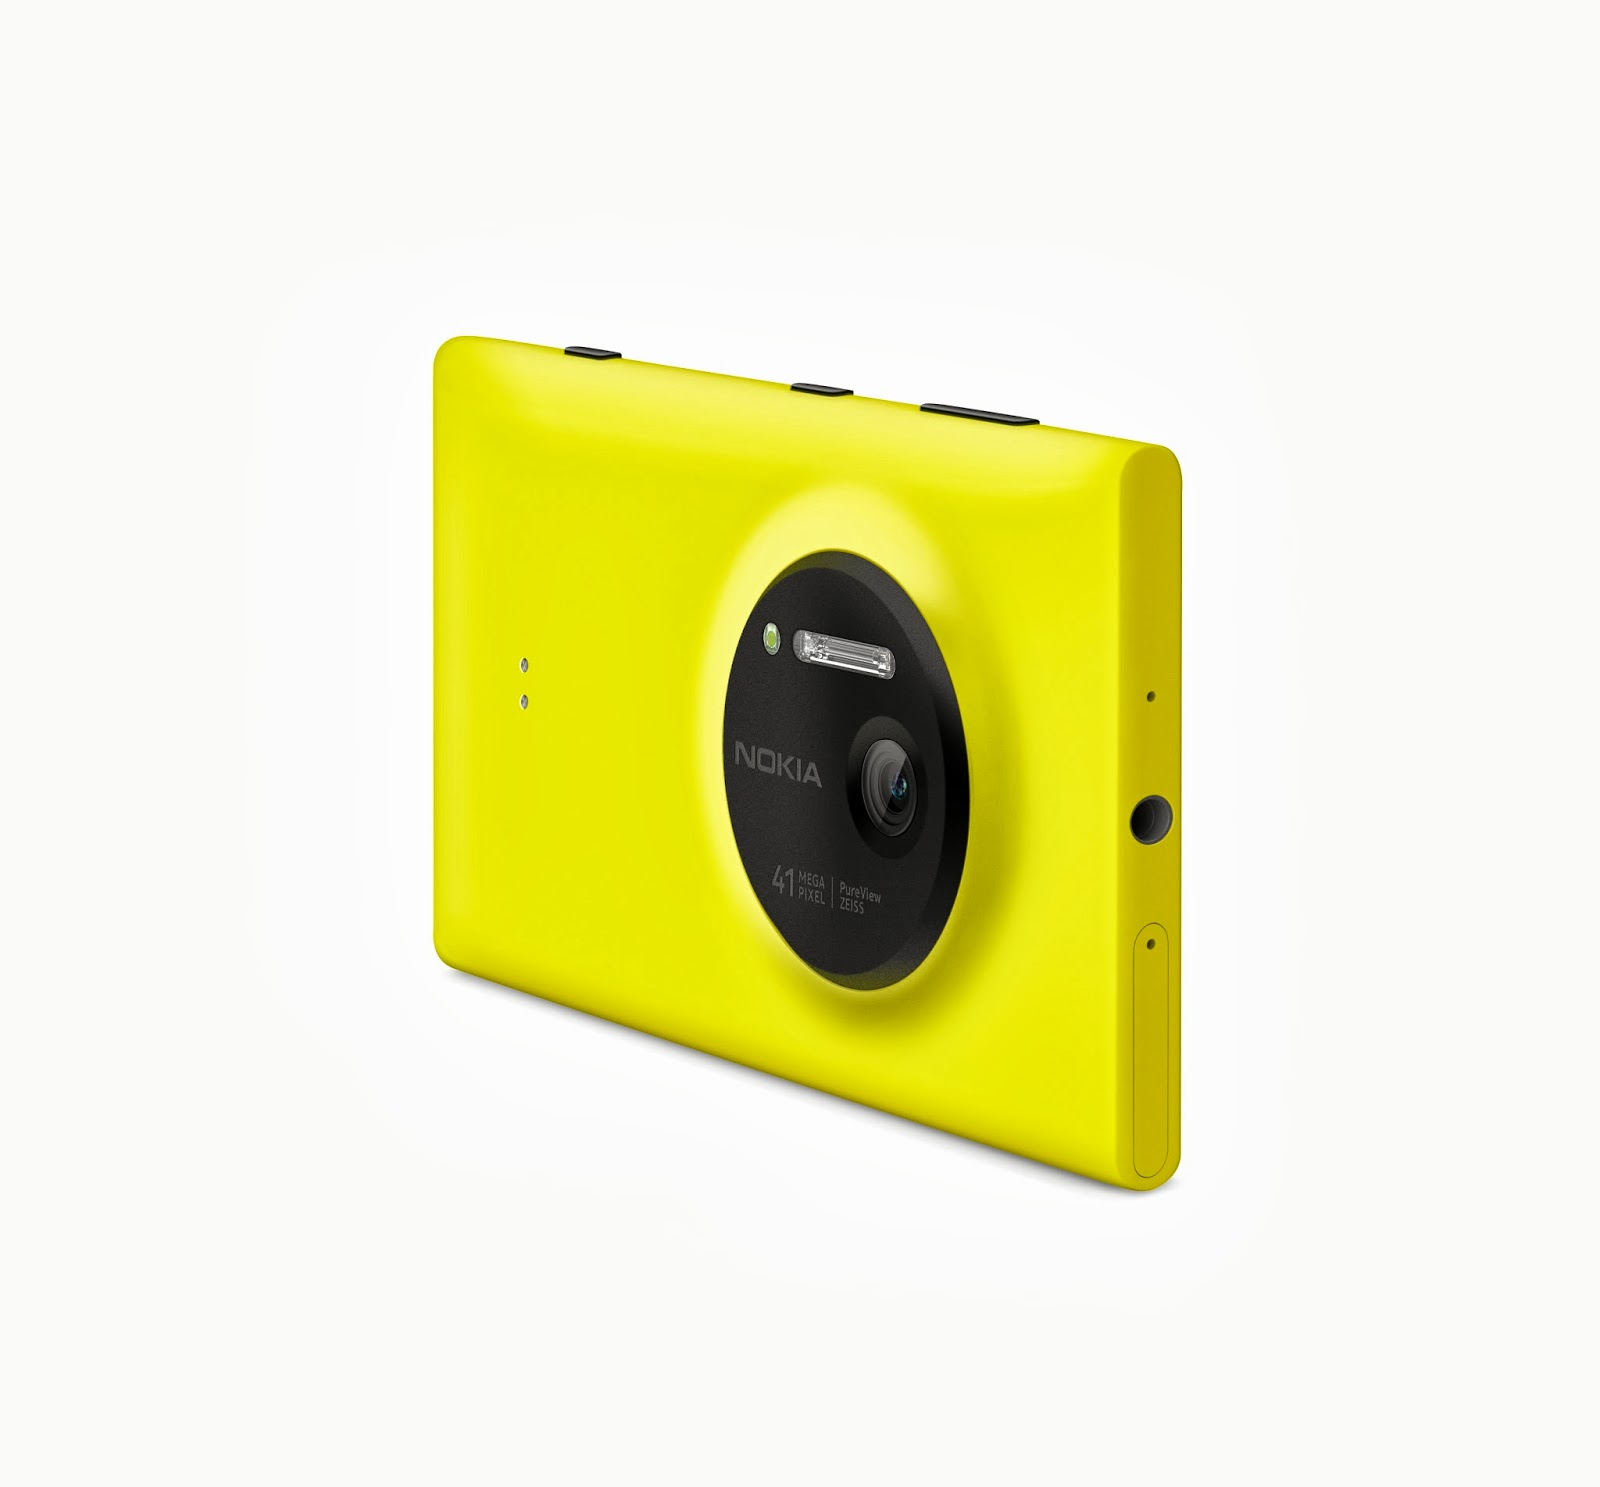 How to take incredible photos with the Nokia Lumia 1020